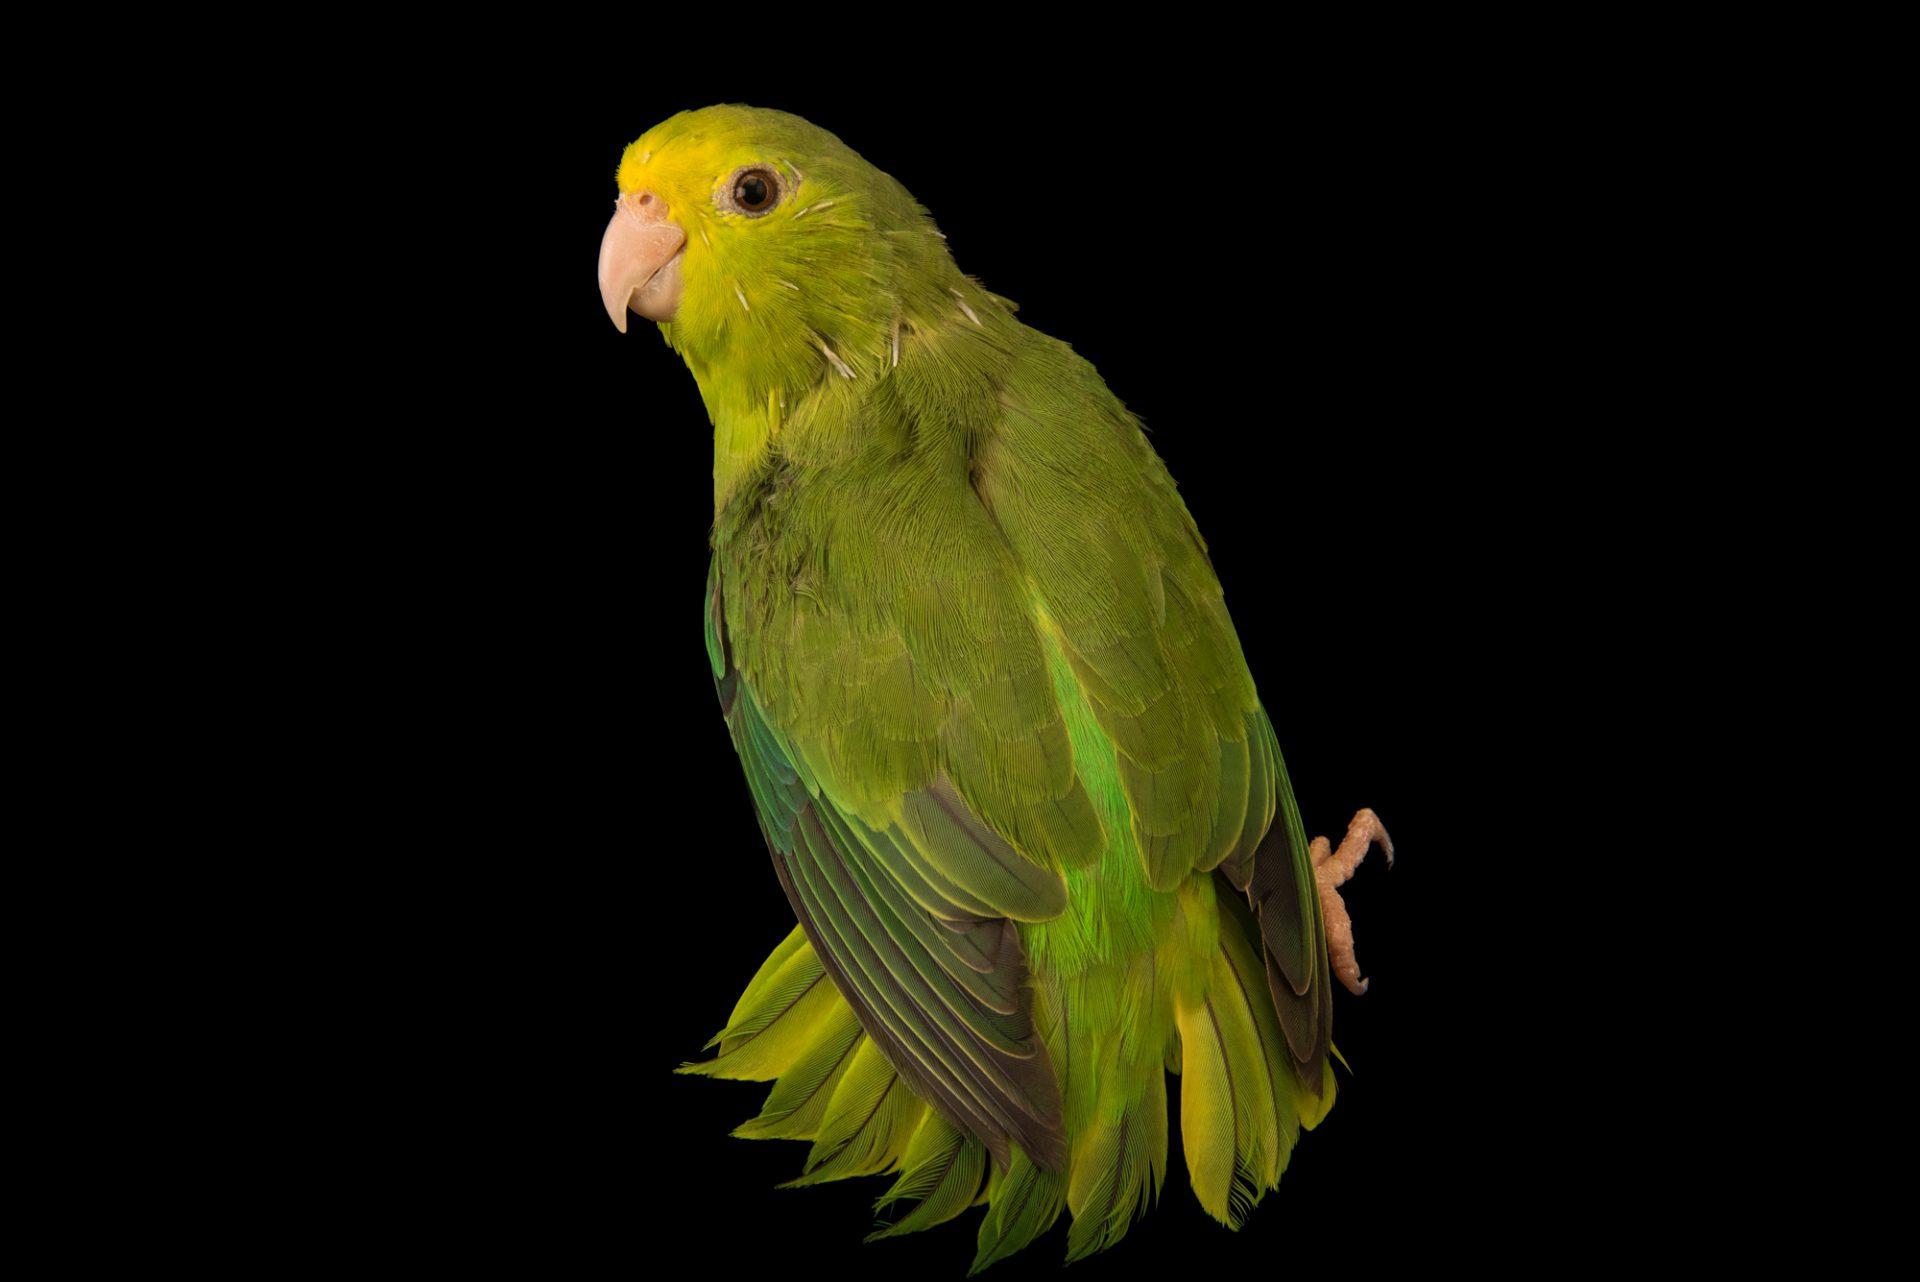 Photo: Turquoise winged parrotlet (Forpus spengeli) at Loro Parque Fundacion.